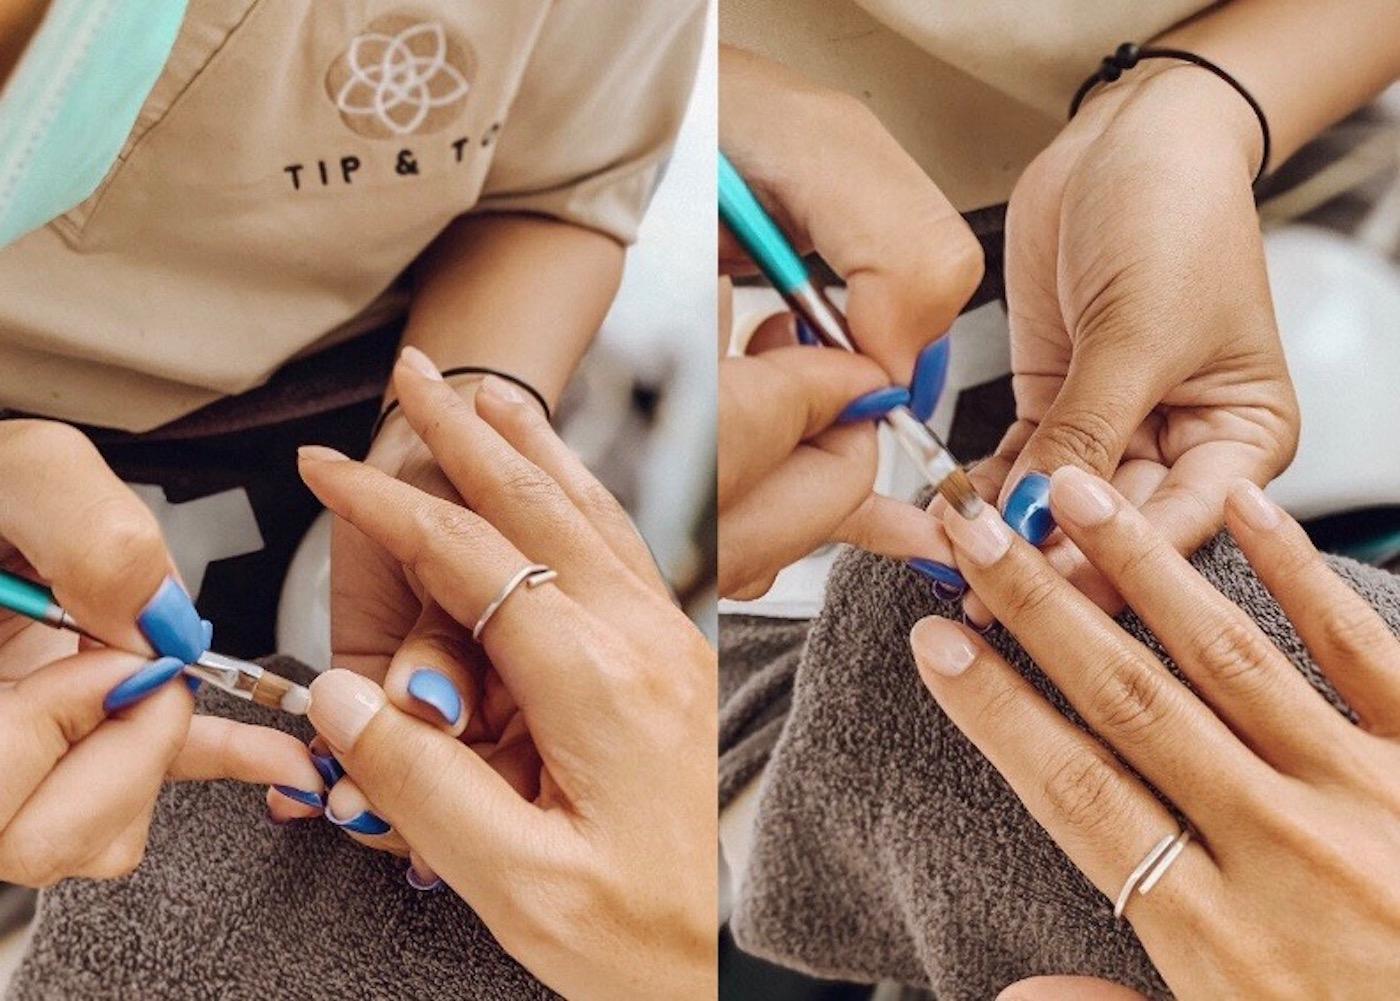 Manicure at Tip & Toe Nail Salon at Tamora Gallery in Canggu, Bali, Indonesia